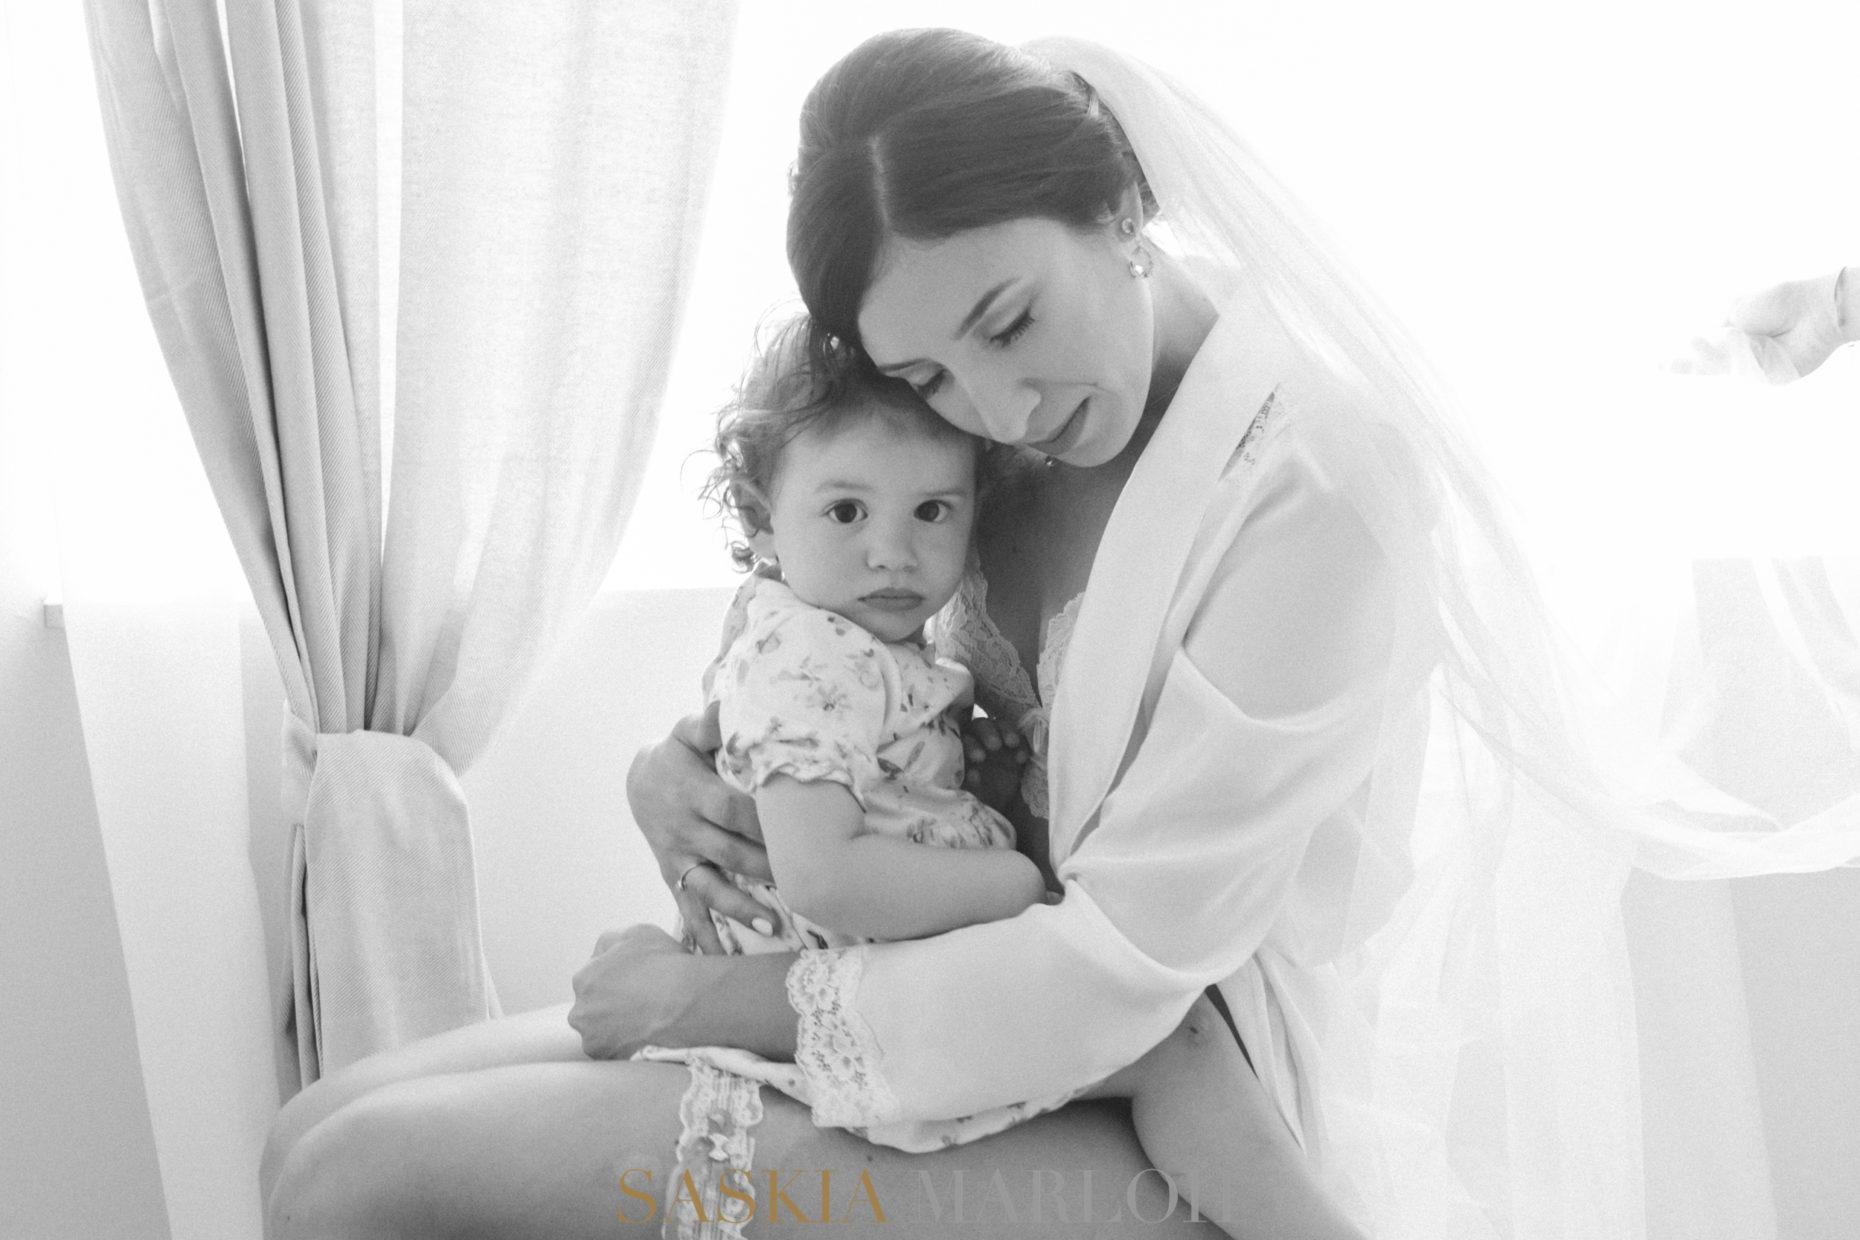 RHEINGAU-ITALIAN-WEDDING-ITALIENISCHE-HOCHZEIT-FOTO-SASKIA-MARLOH-PHOTOGRAPHY-73